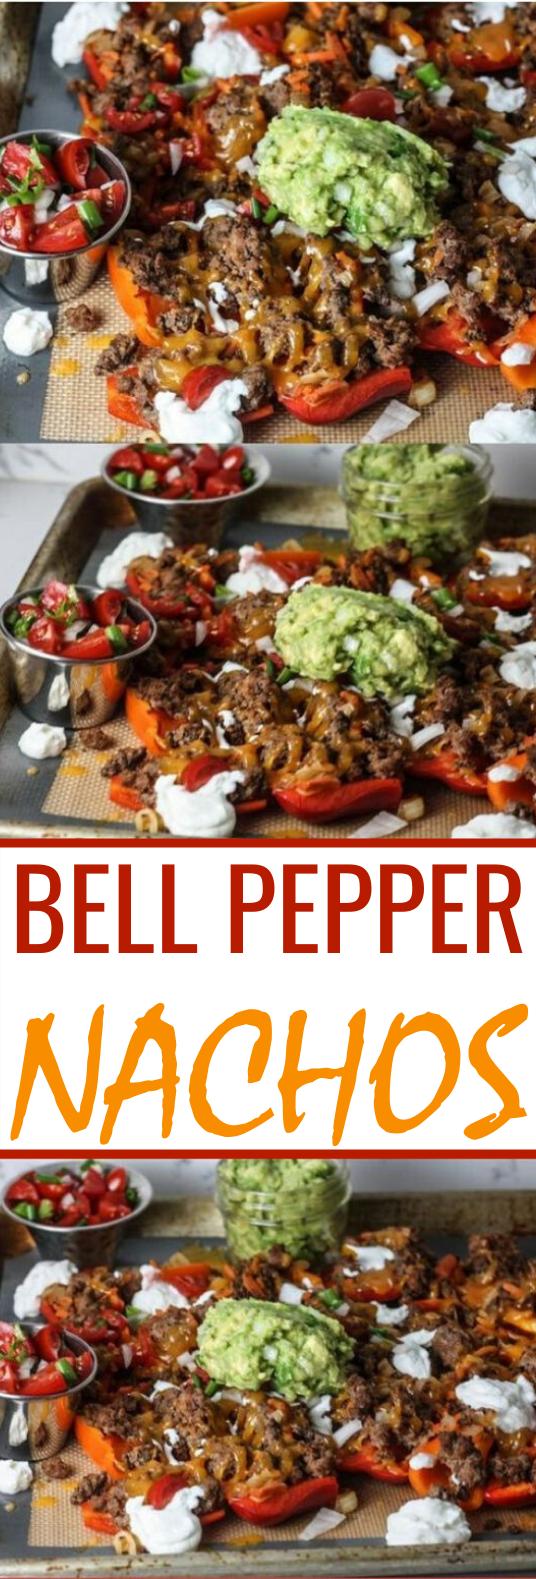 Bell Pepper Nachos #keto #lowcarb #dinner #diet #lunch